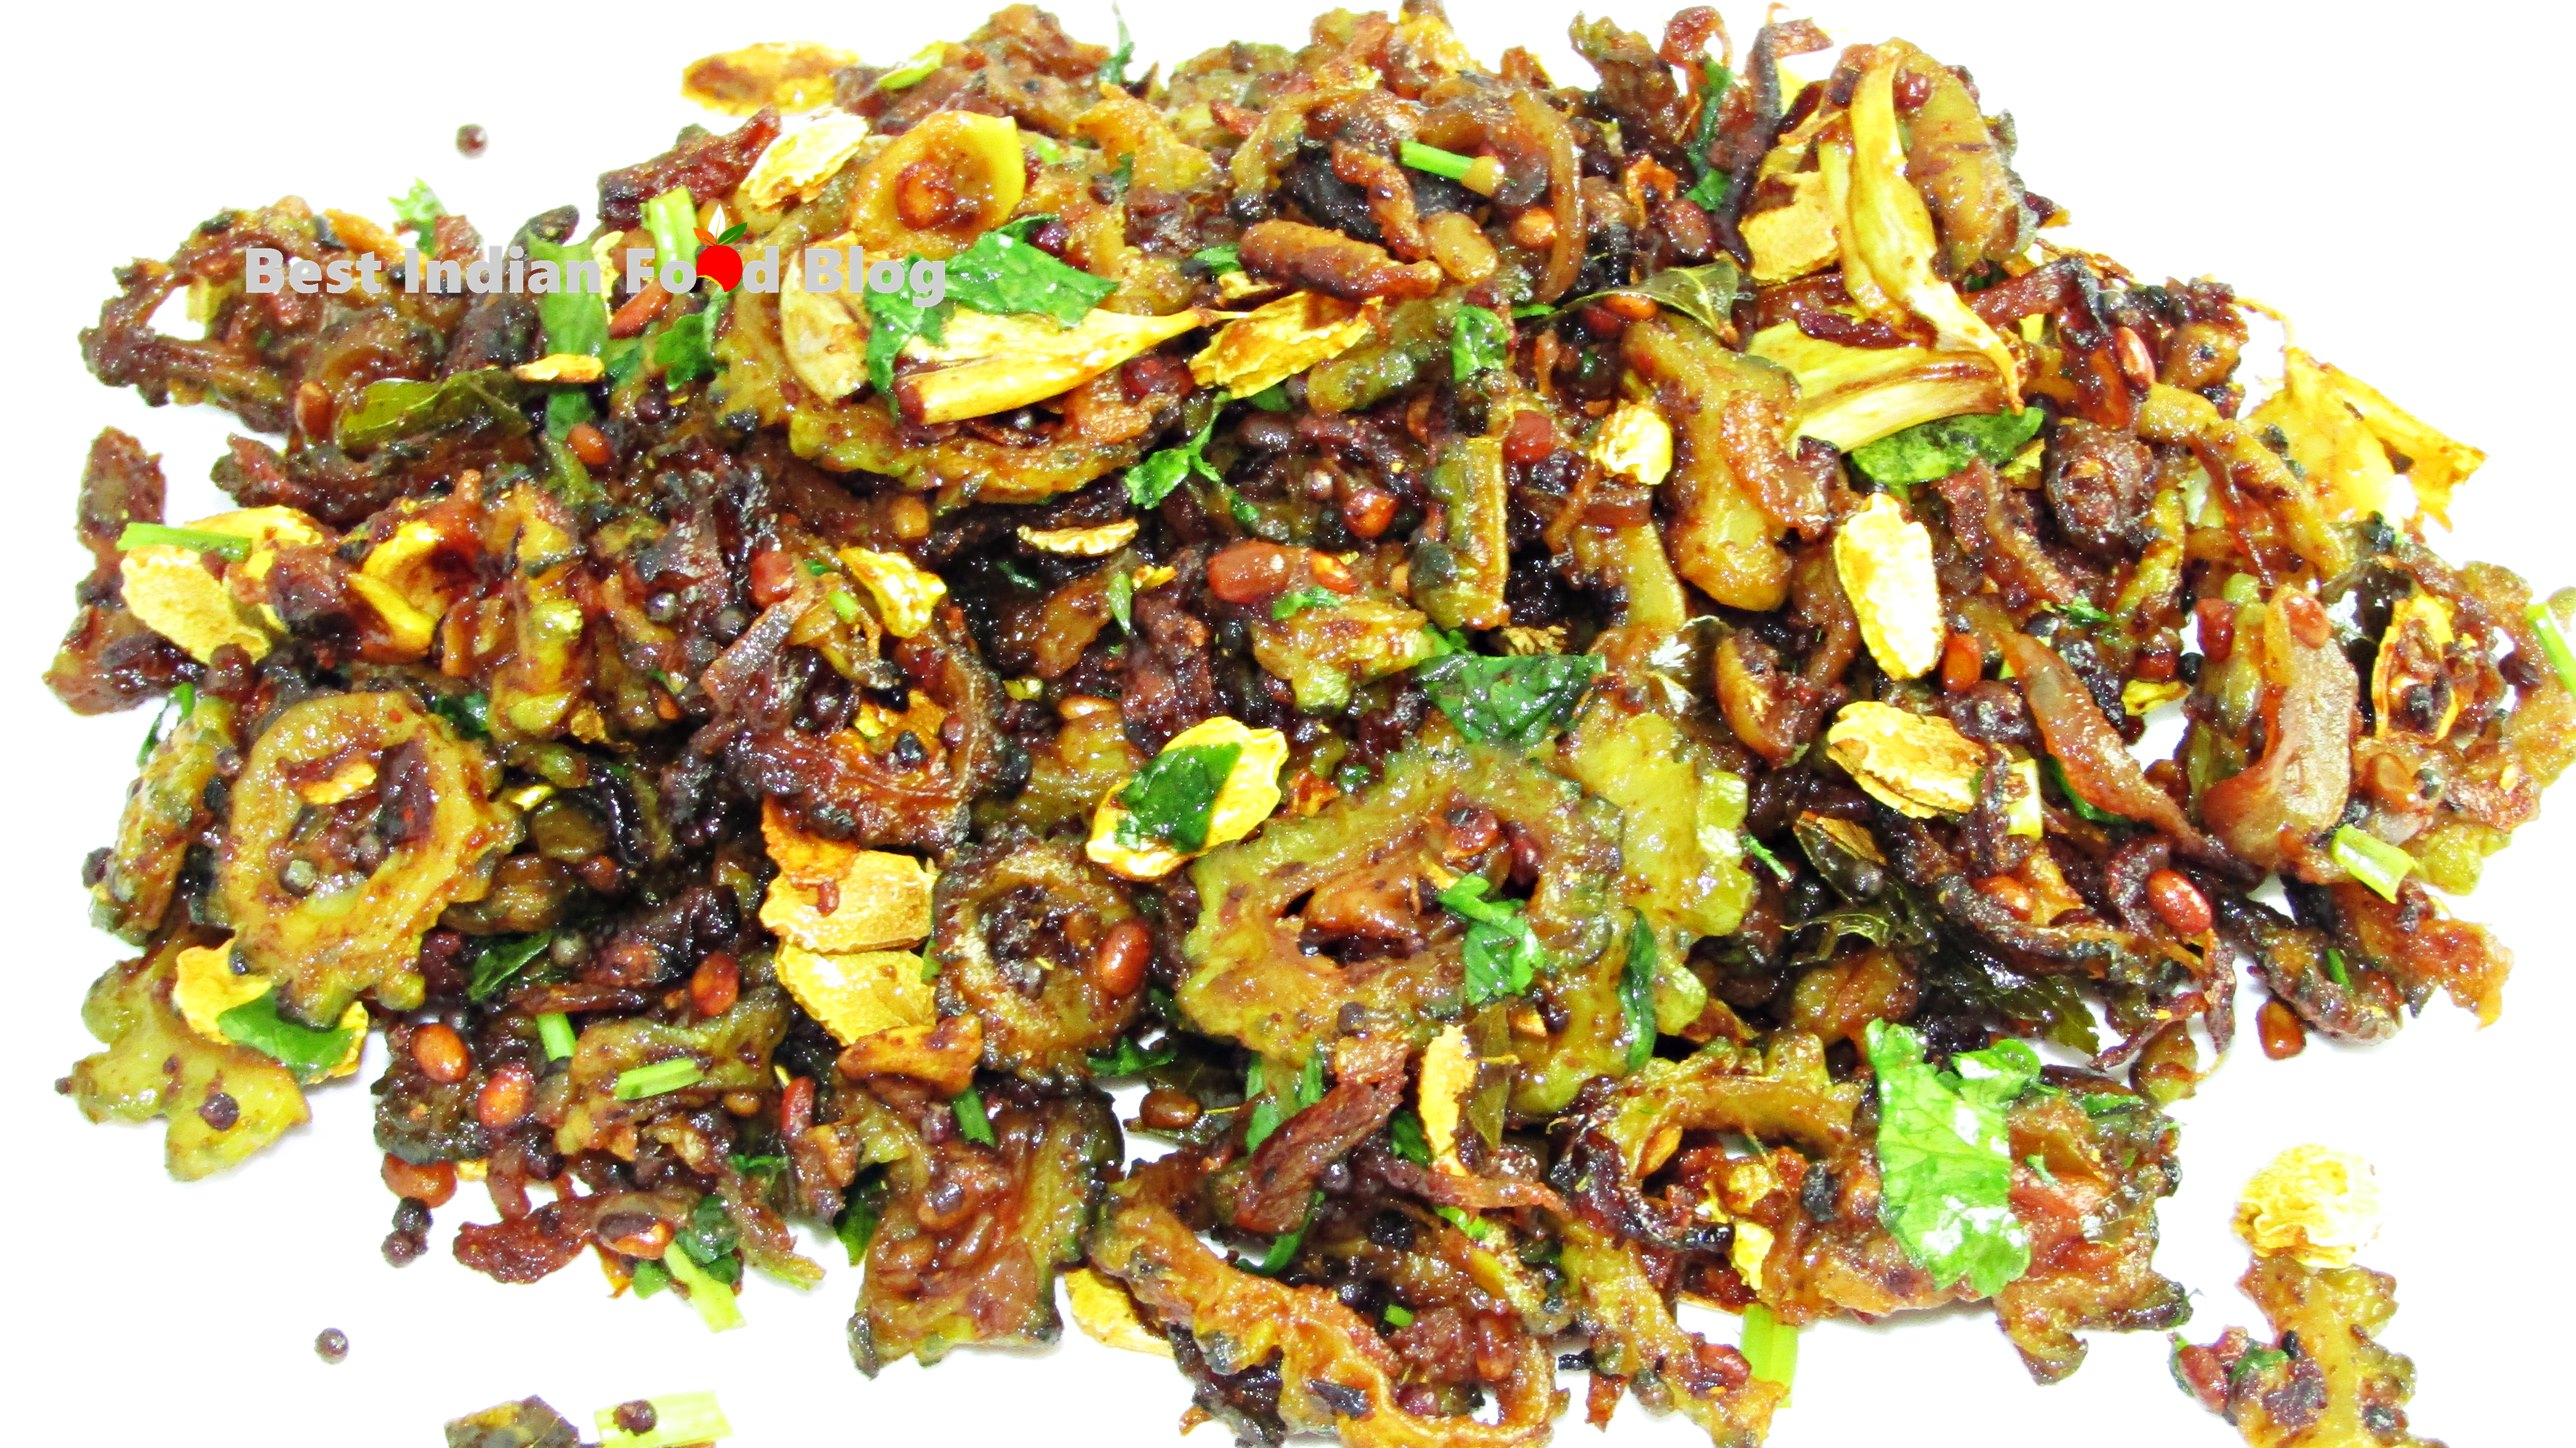 Pavakkai Phrai Ceyuka from Kerala, India | Best Indian Food Blog